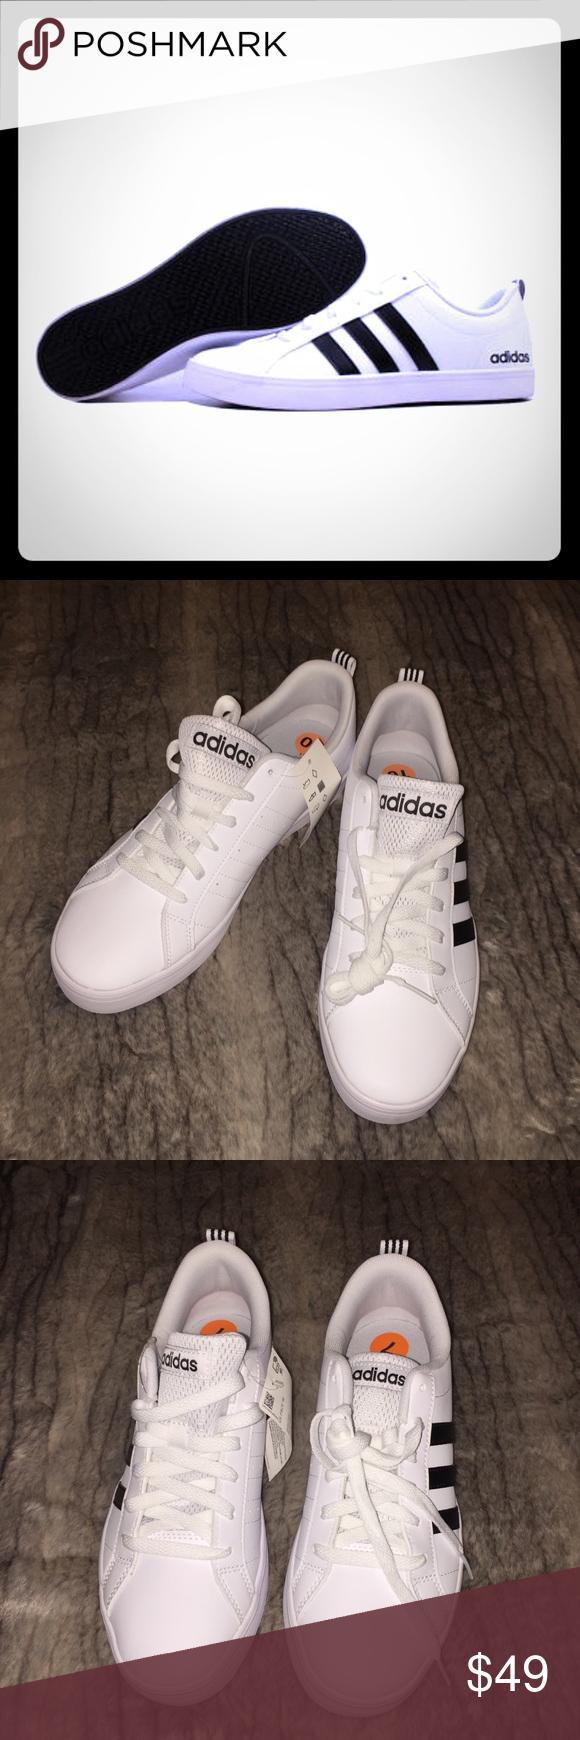 adidas size 7 brand new nwt